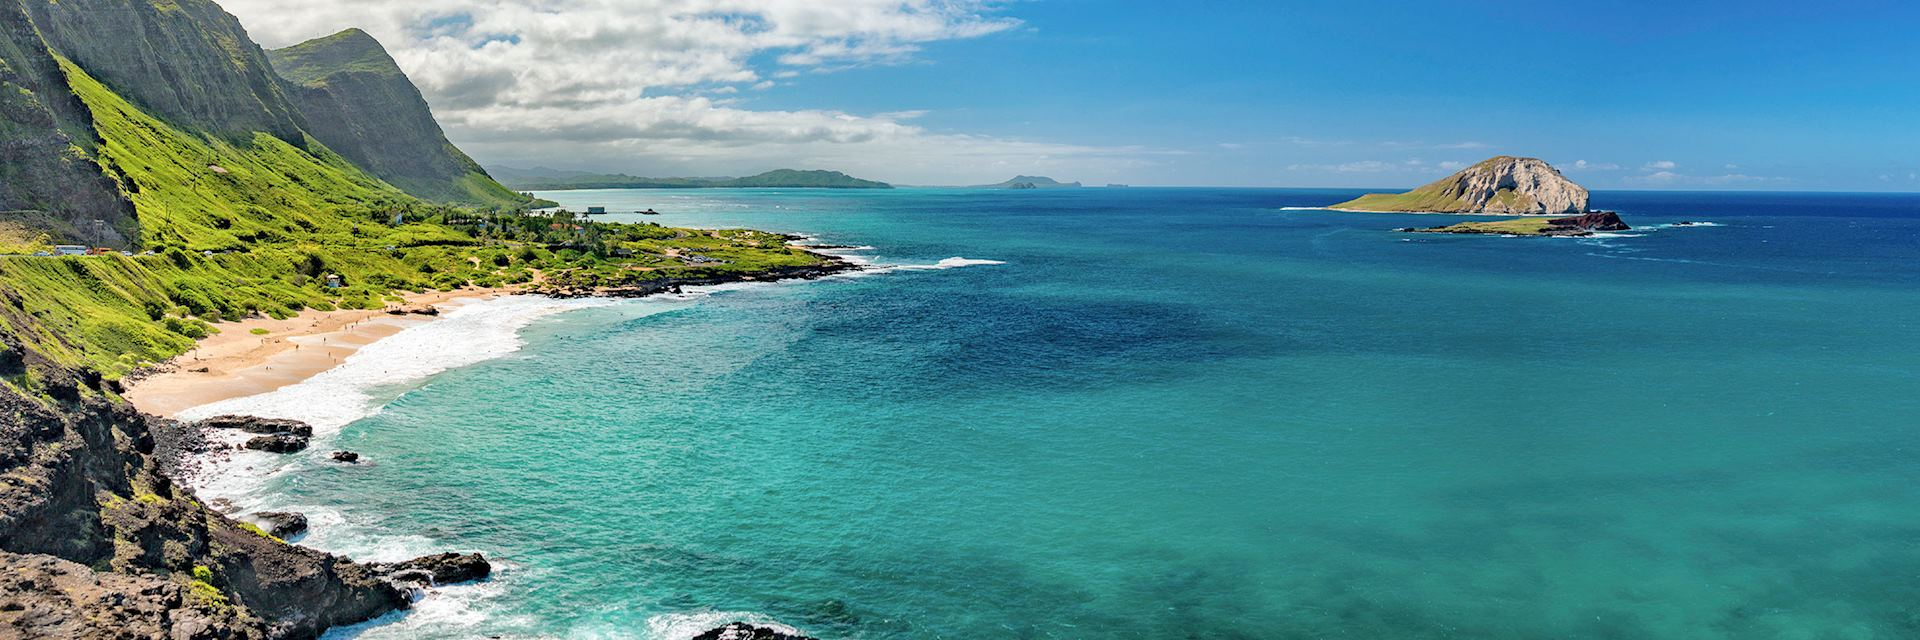 Lanai coastline, Hawaii